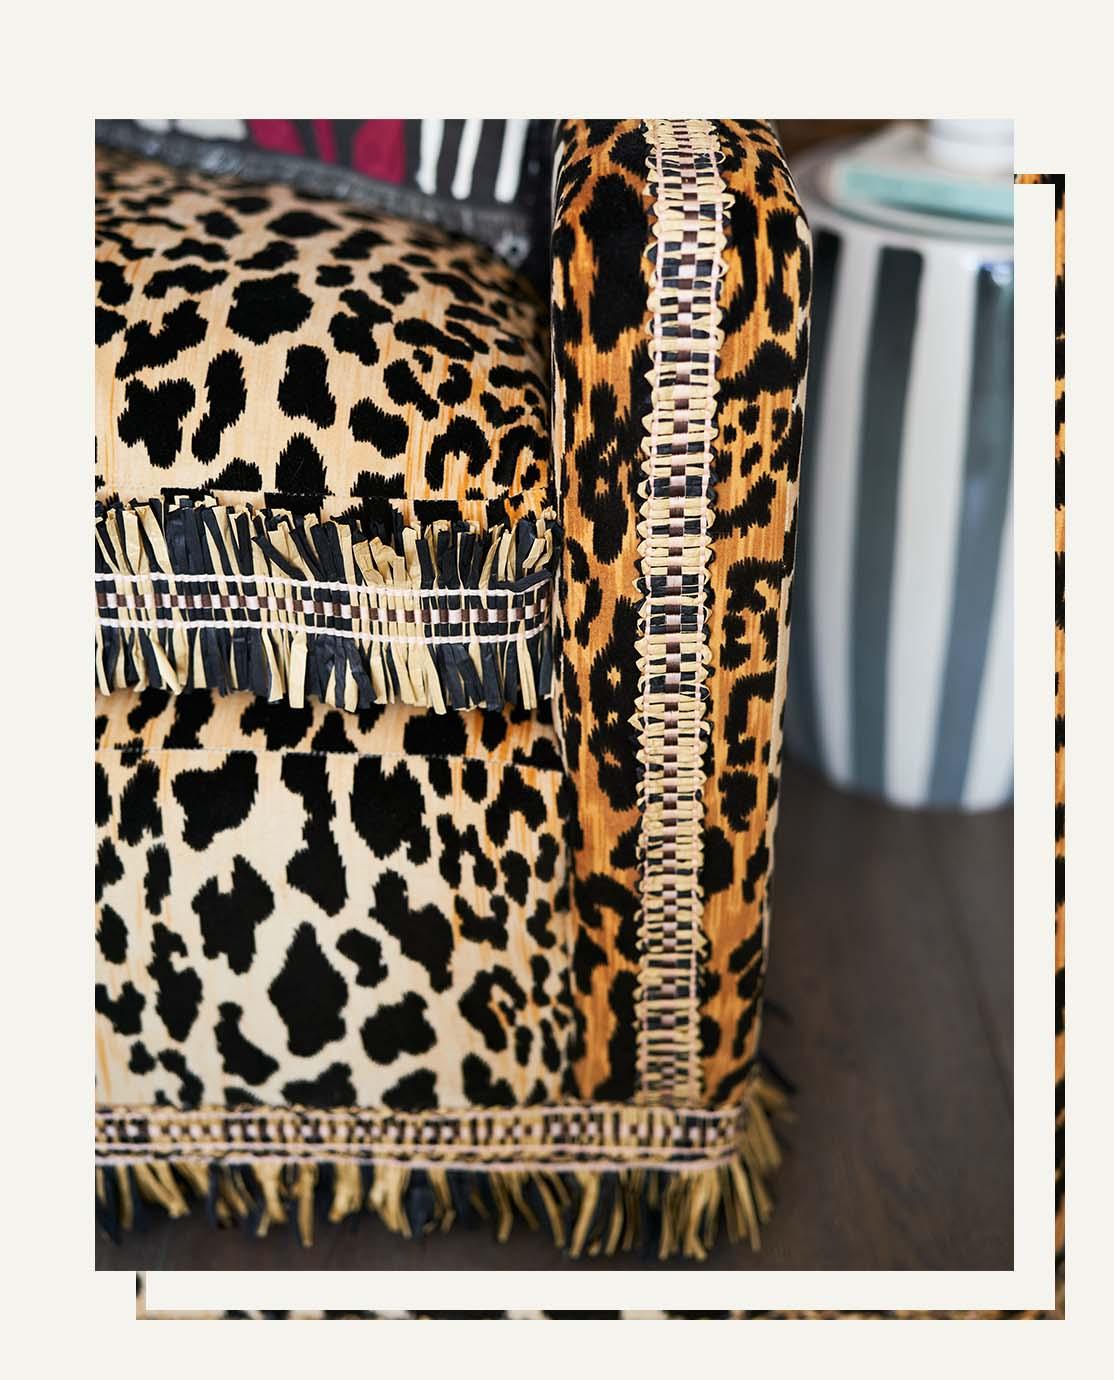 A close-up of ourb bespoke leopard print sofa and rafia trim